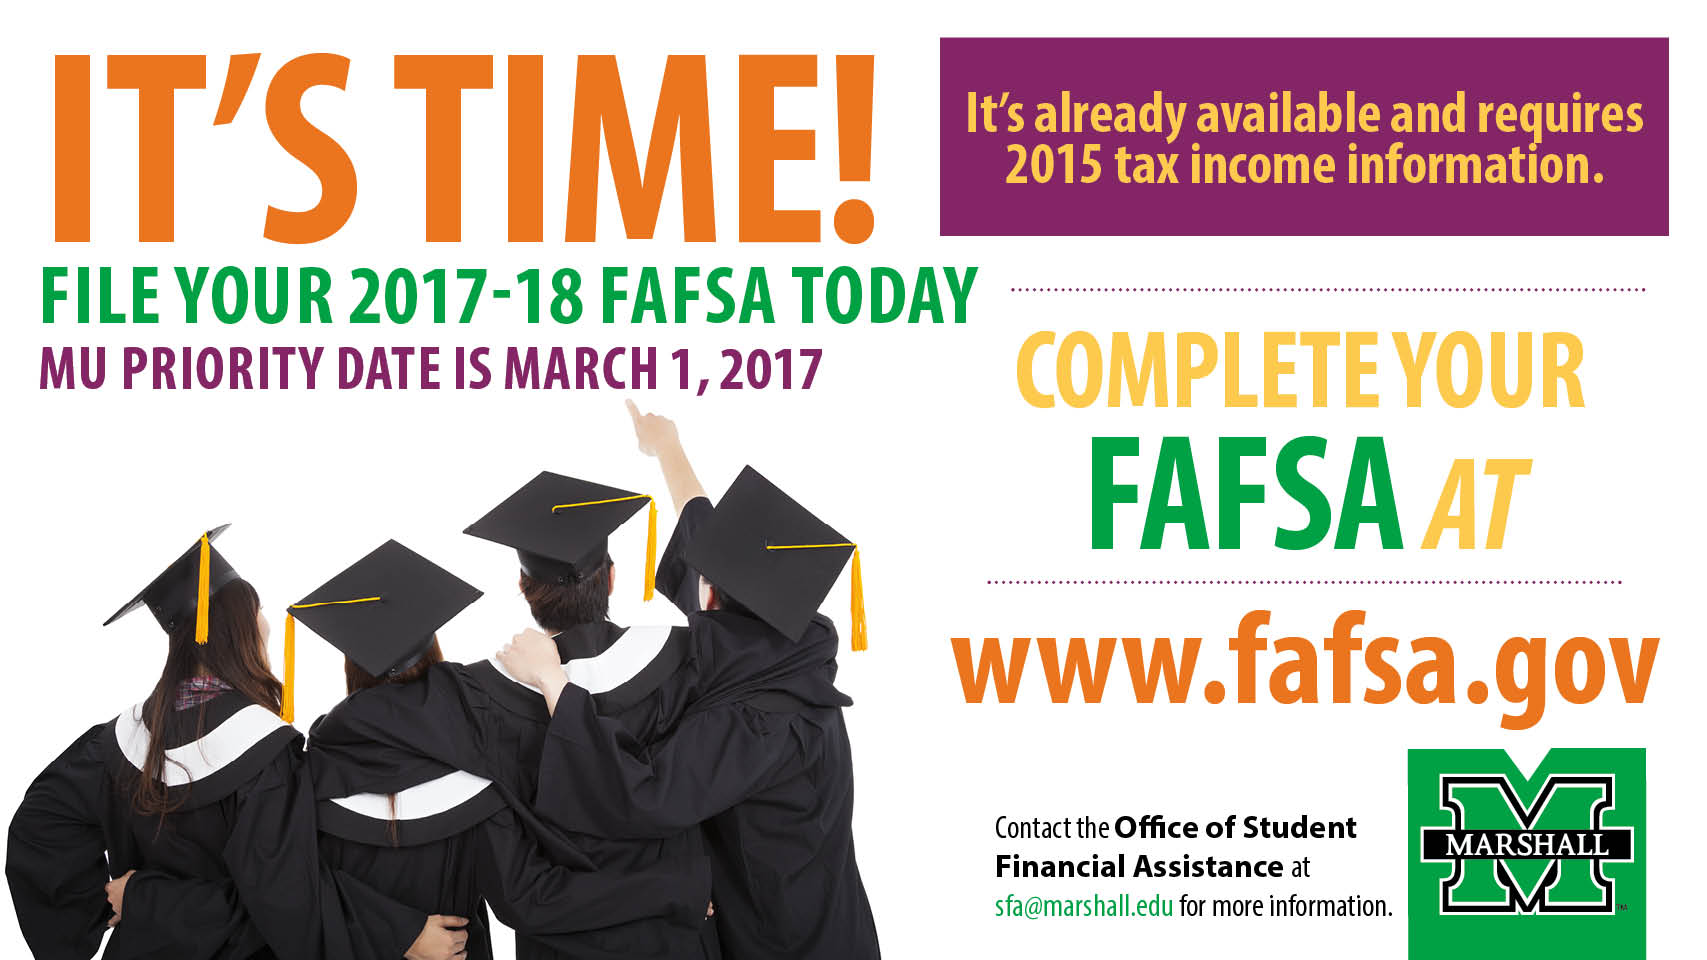 fafsa-complete-1718-w-deadline